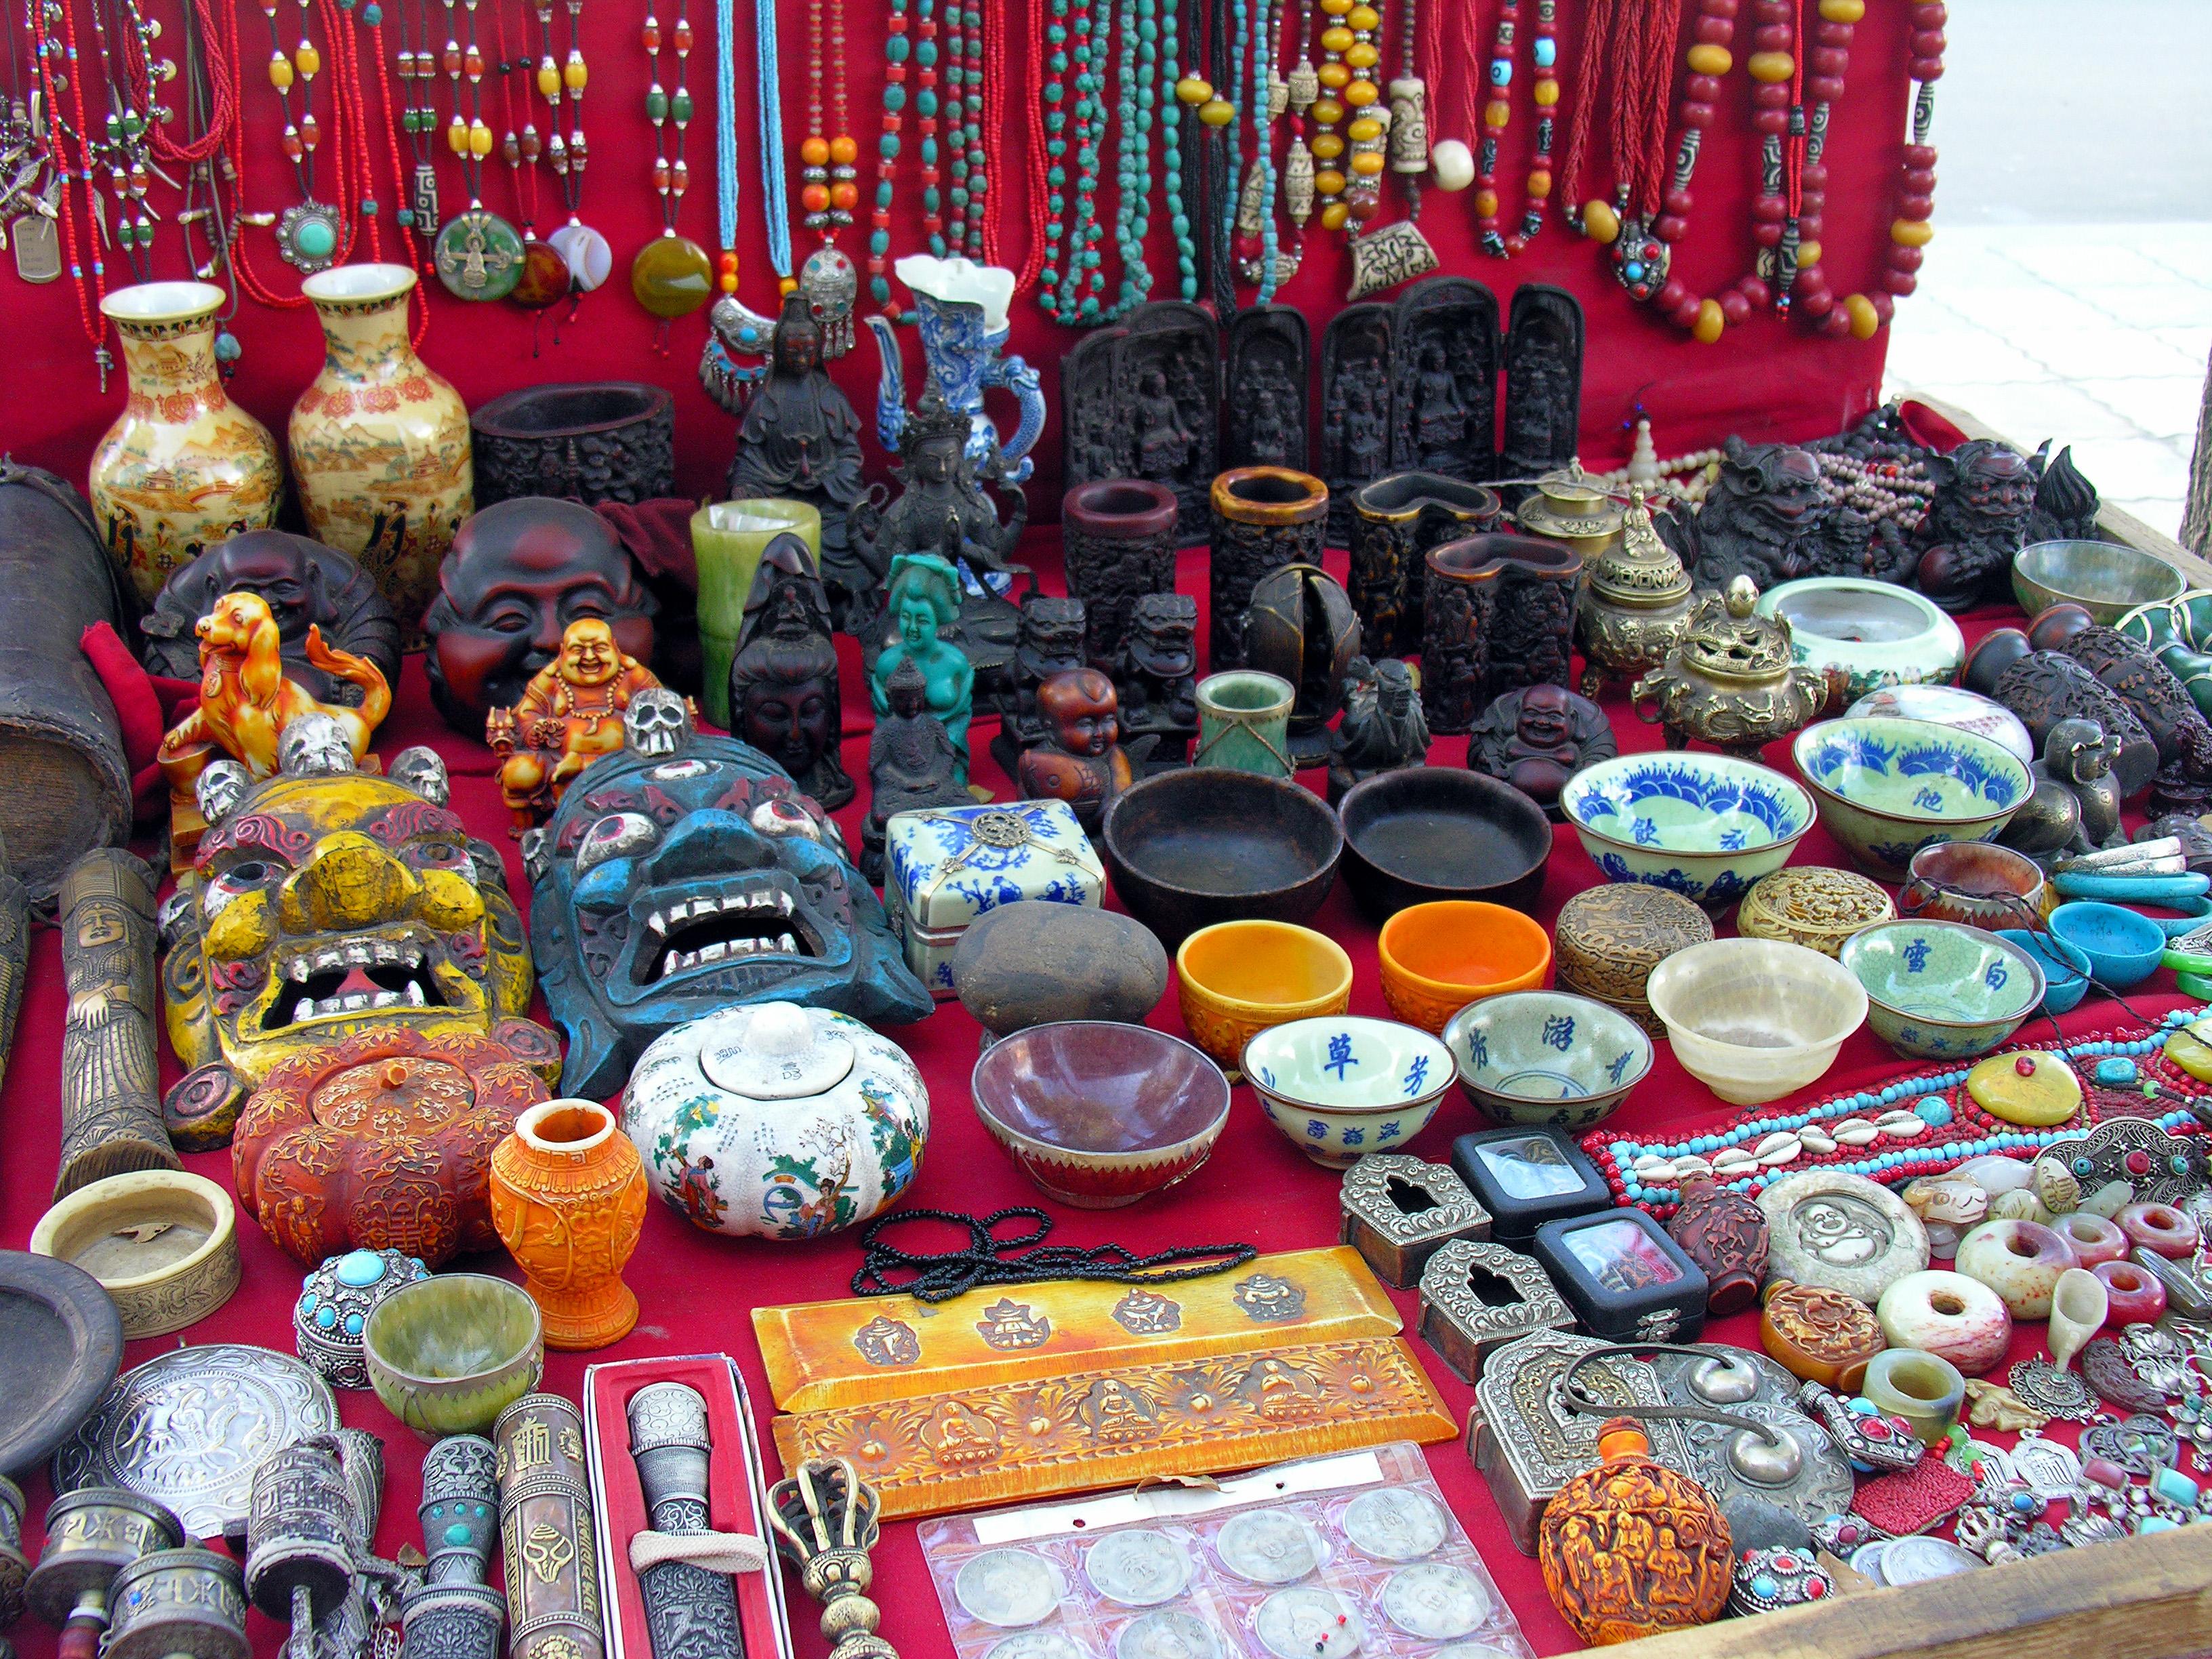 Street sale photo